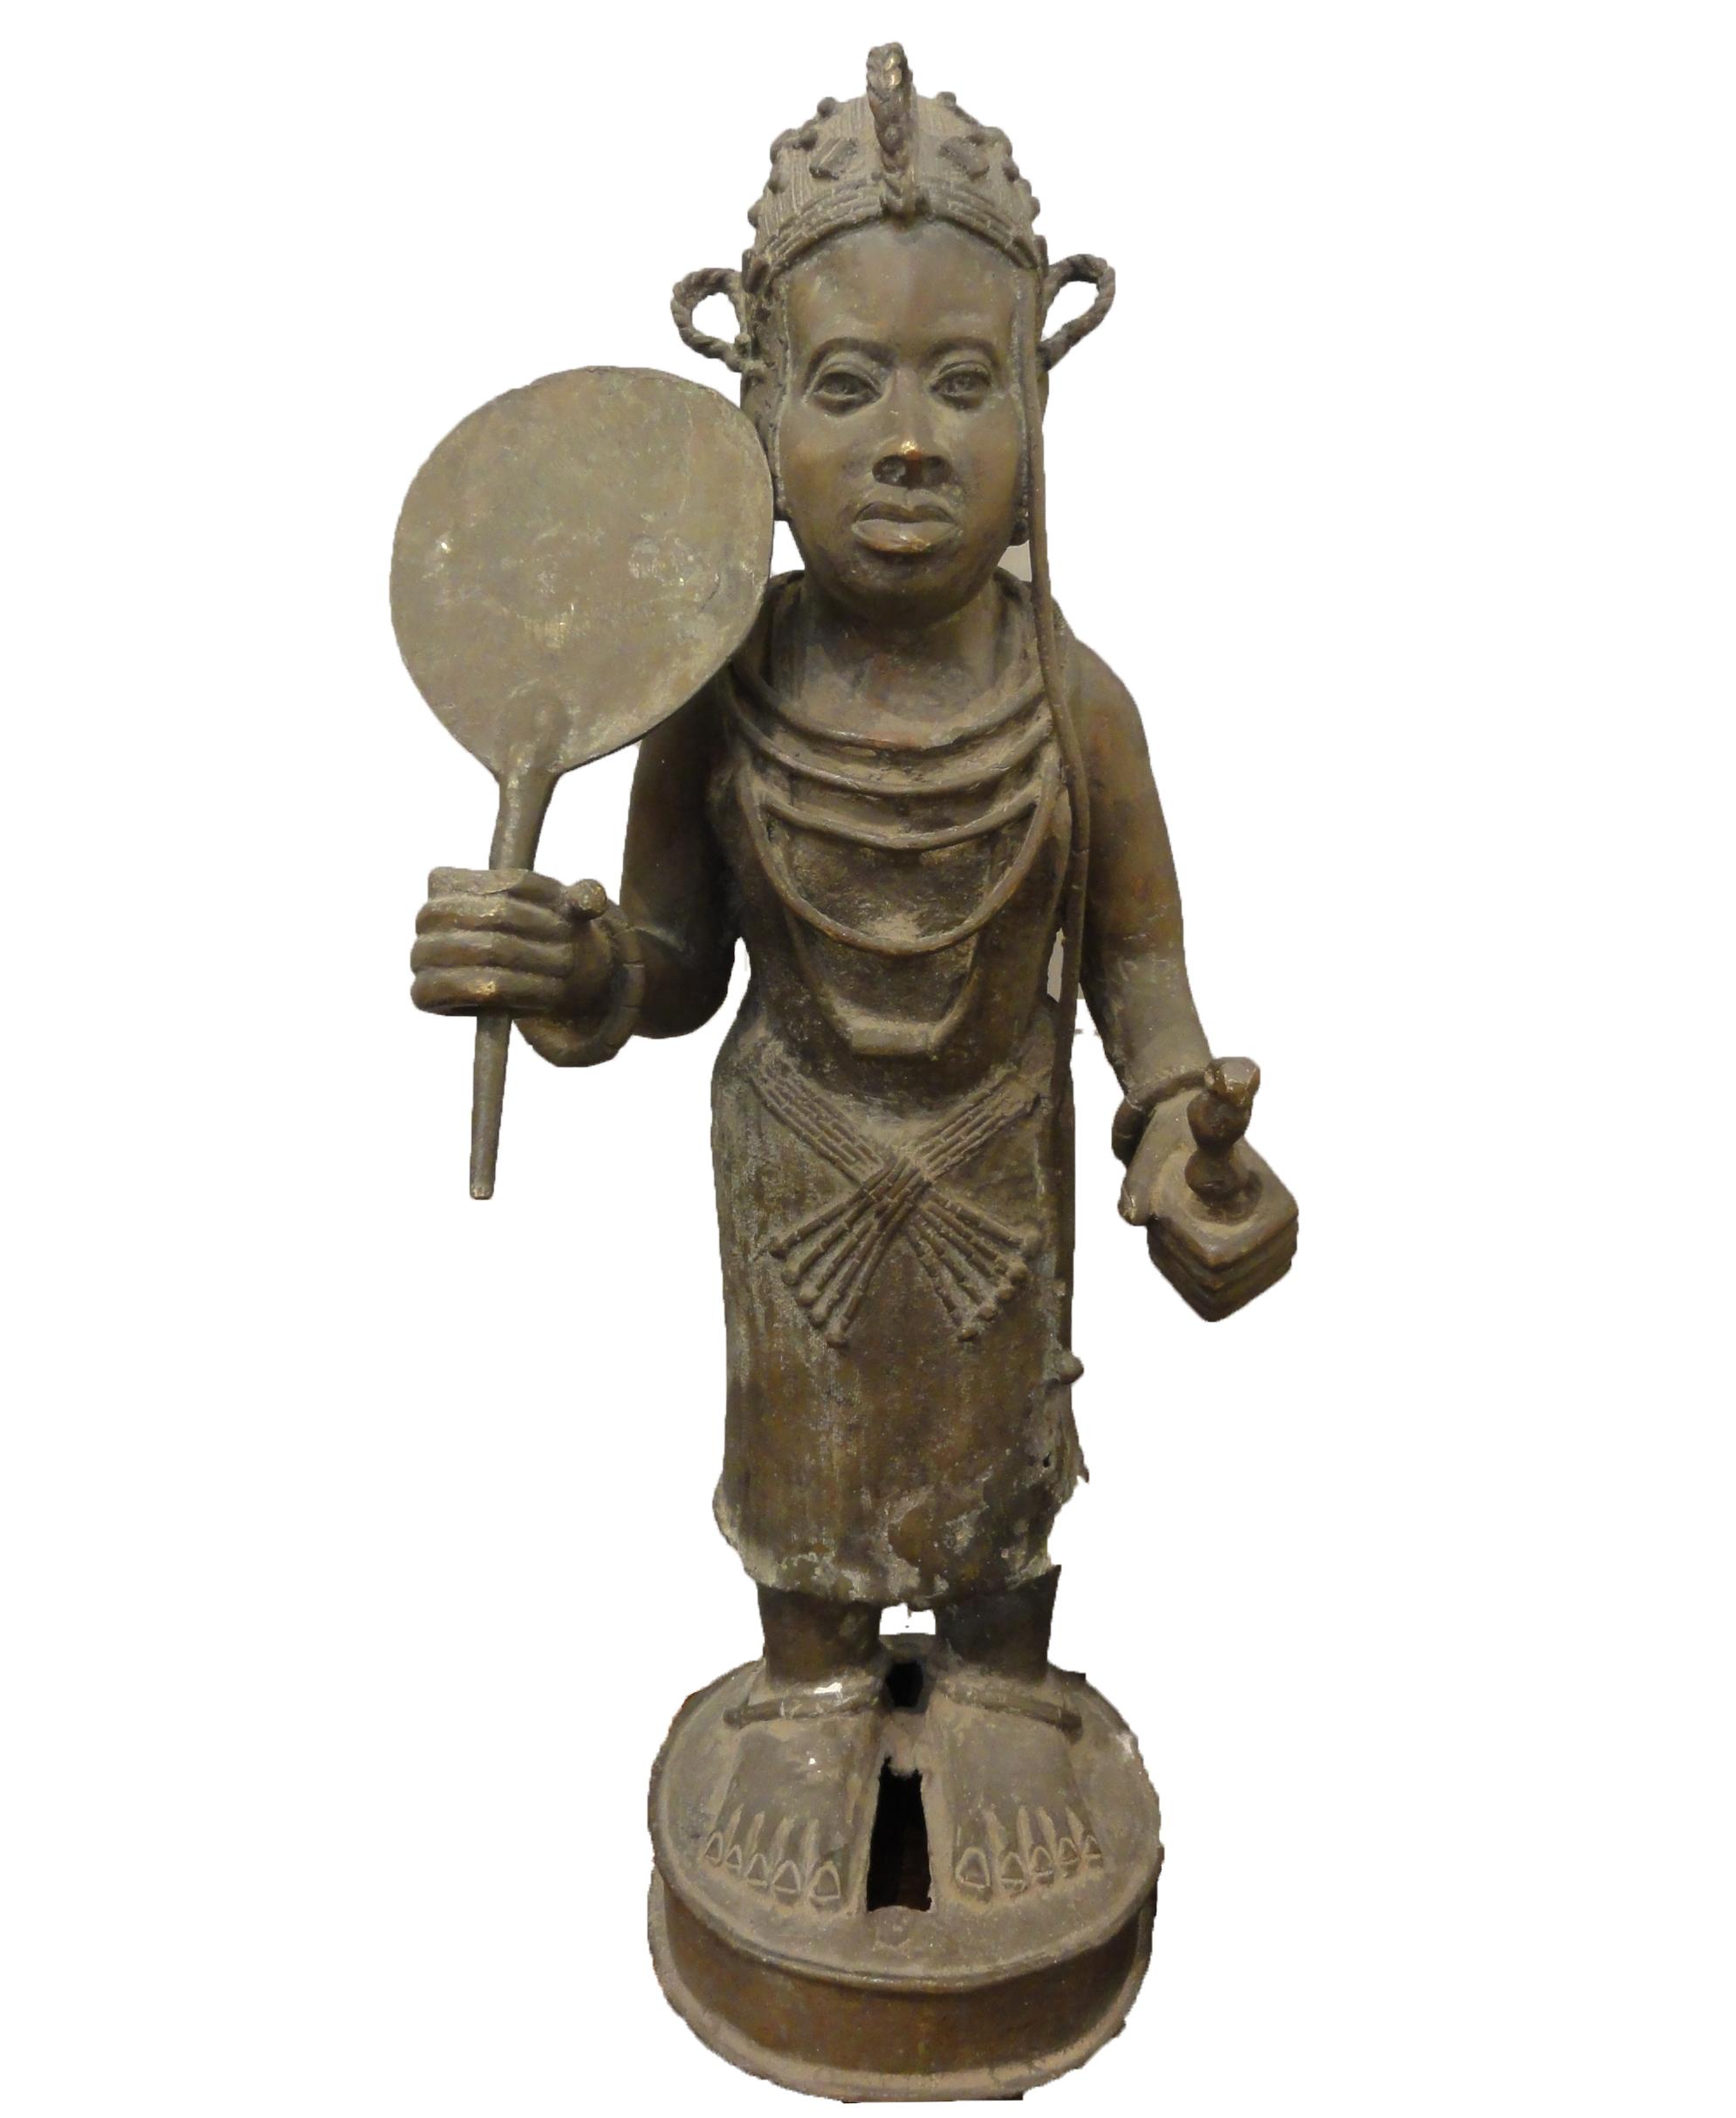 BENIN KINGDOM - LAST KING, OBA - Circa 1900 santa barbara design center statue -